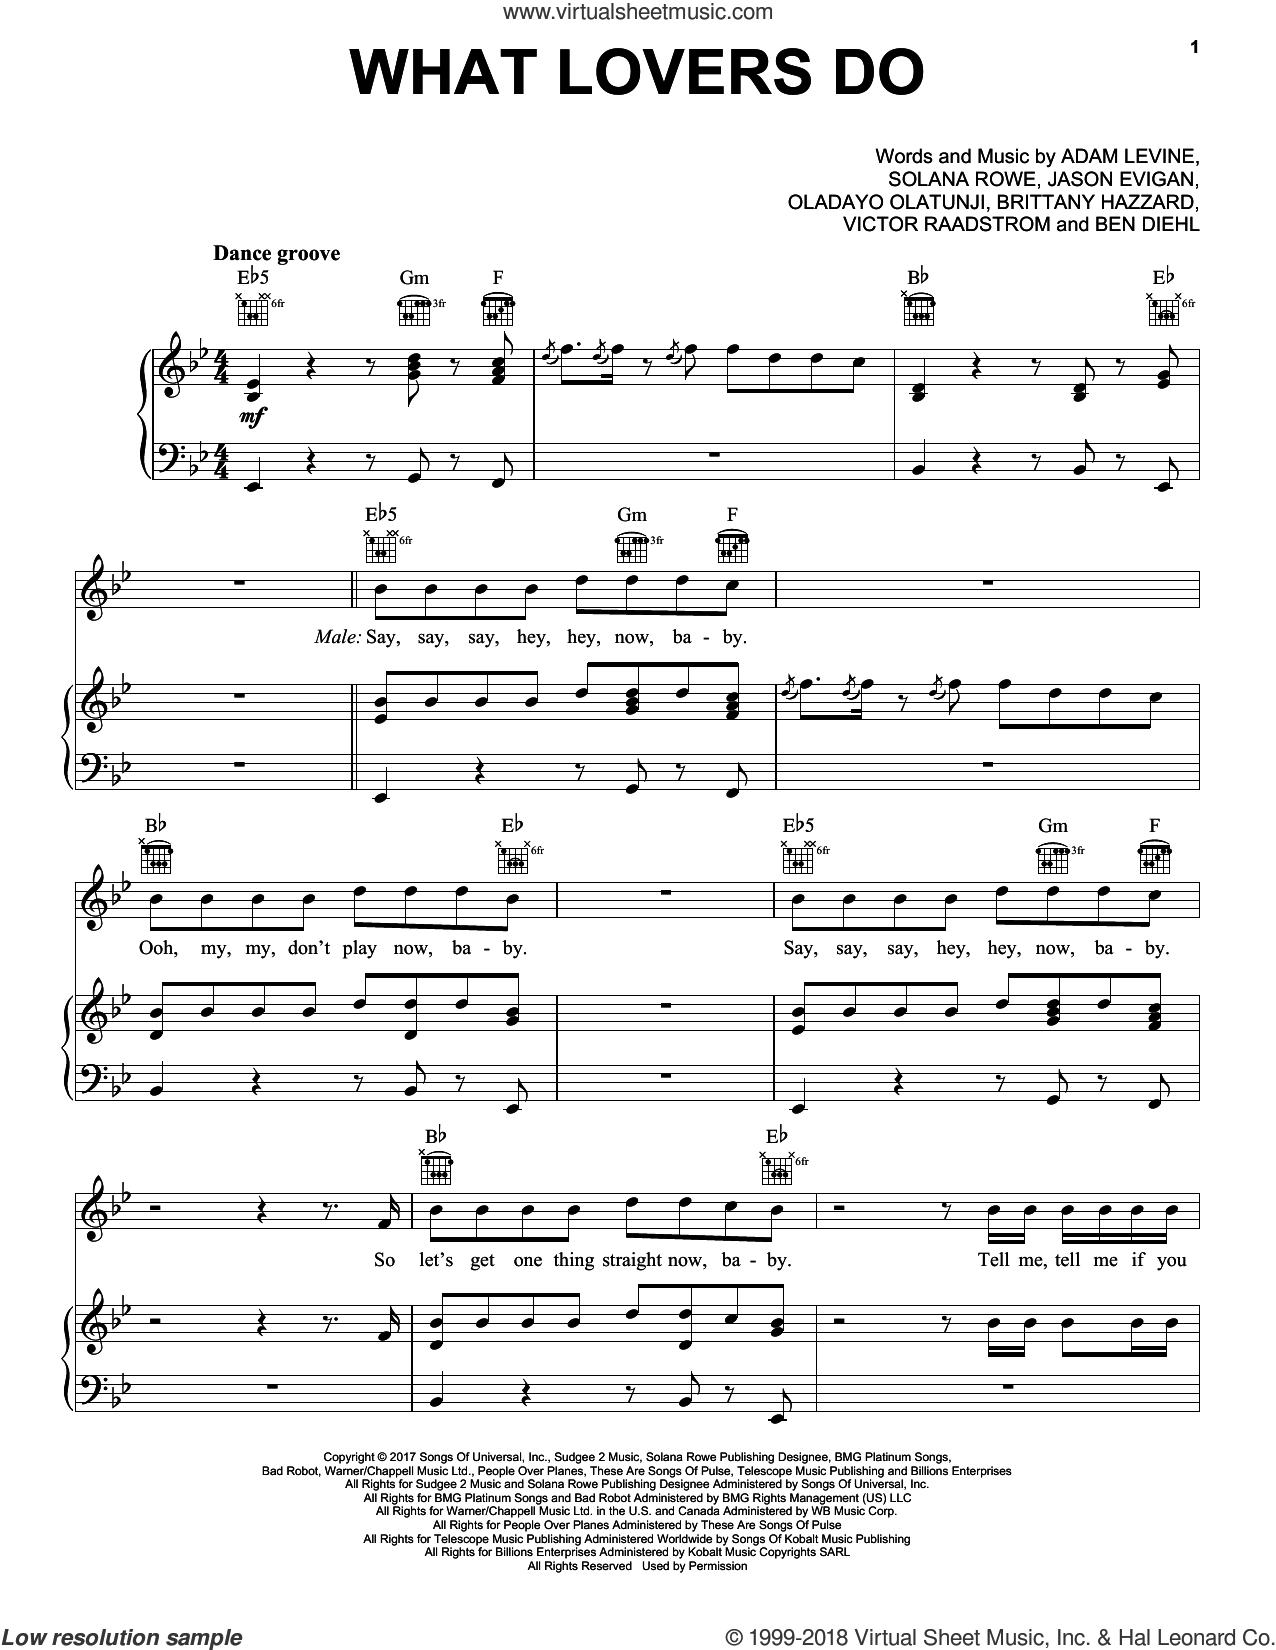 What Lovers Do sheet music for voice, piano or guitar by Maroon 5, Adam Levine, Benjamin Diehl, Brittany Hazzard, Jason Evigan, Oladayo Olatunji and Solana Rowe, intermediate skill level